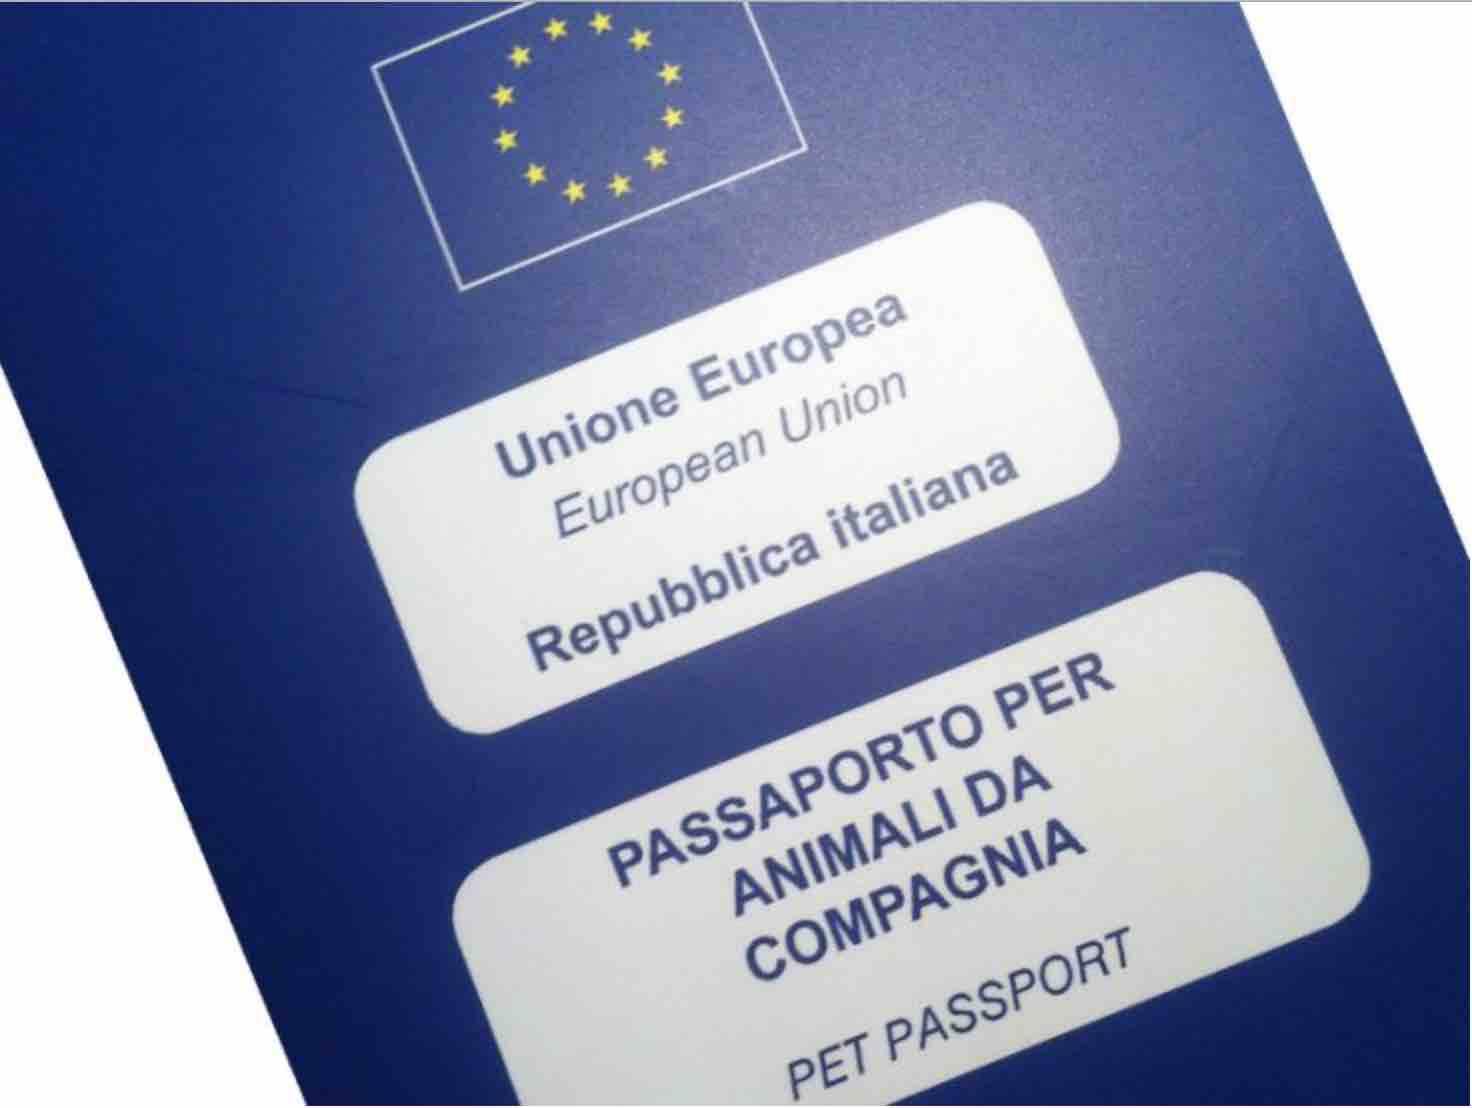 passaporto animali domestici